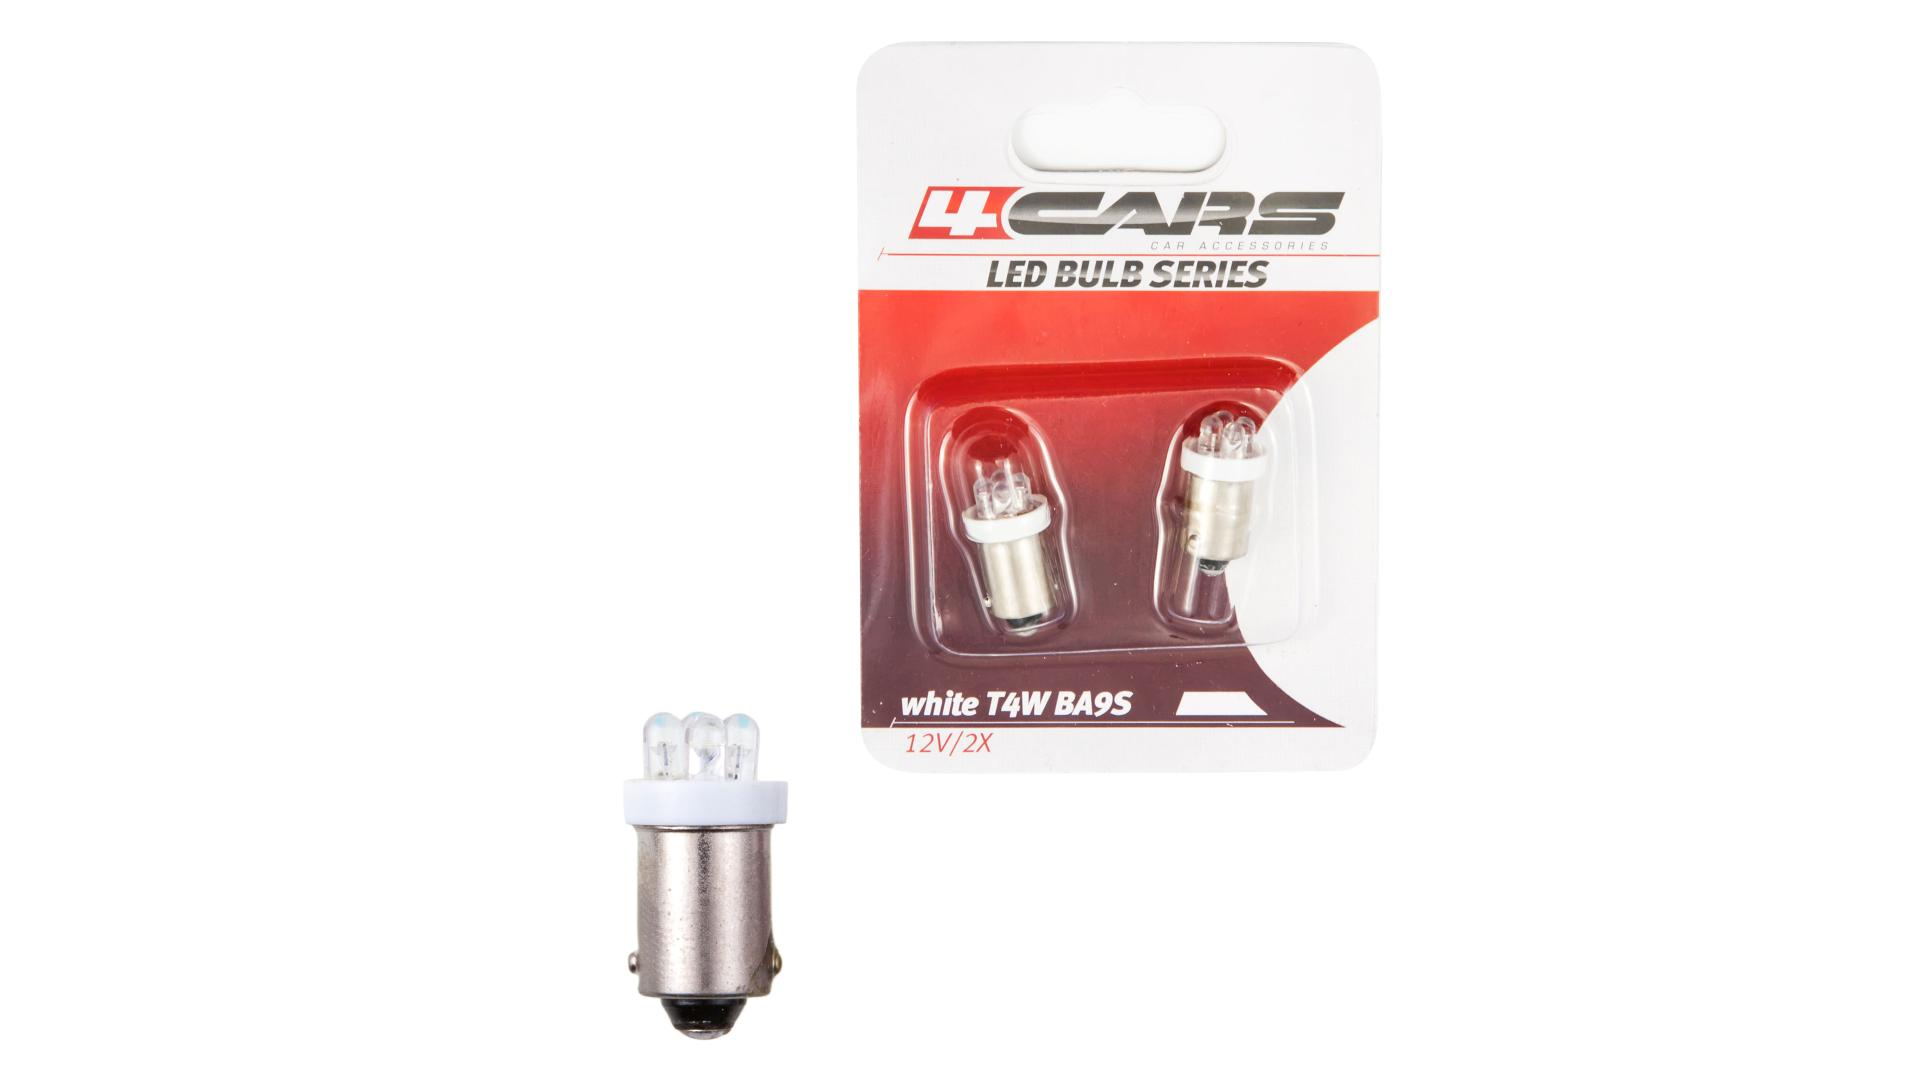 4CARS LED žárovka 4LED 12V BA9S